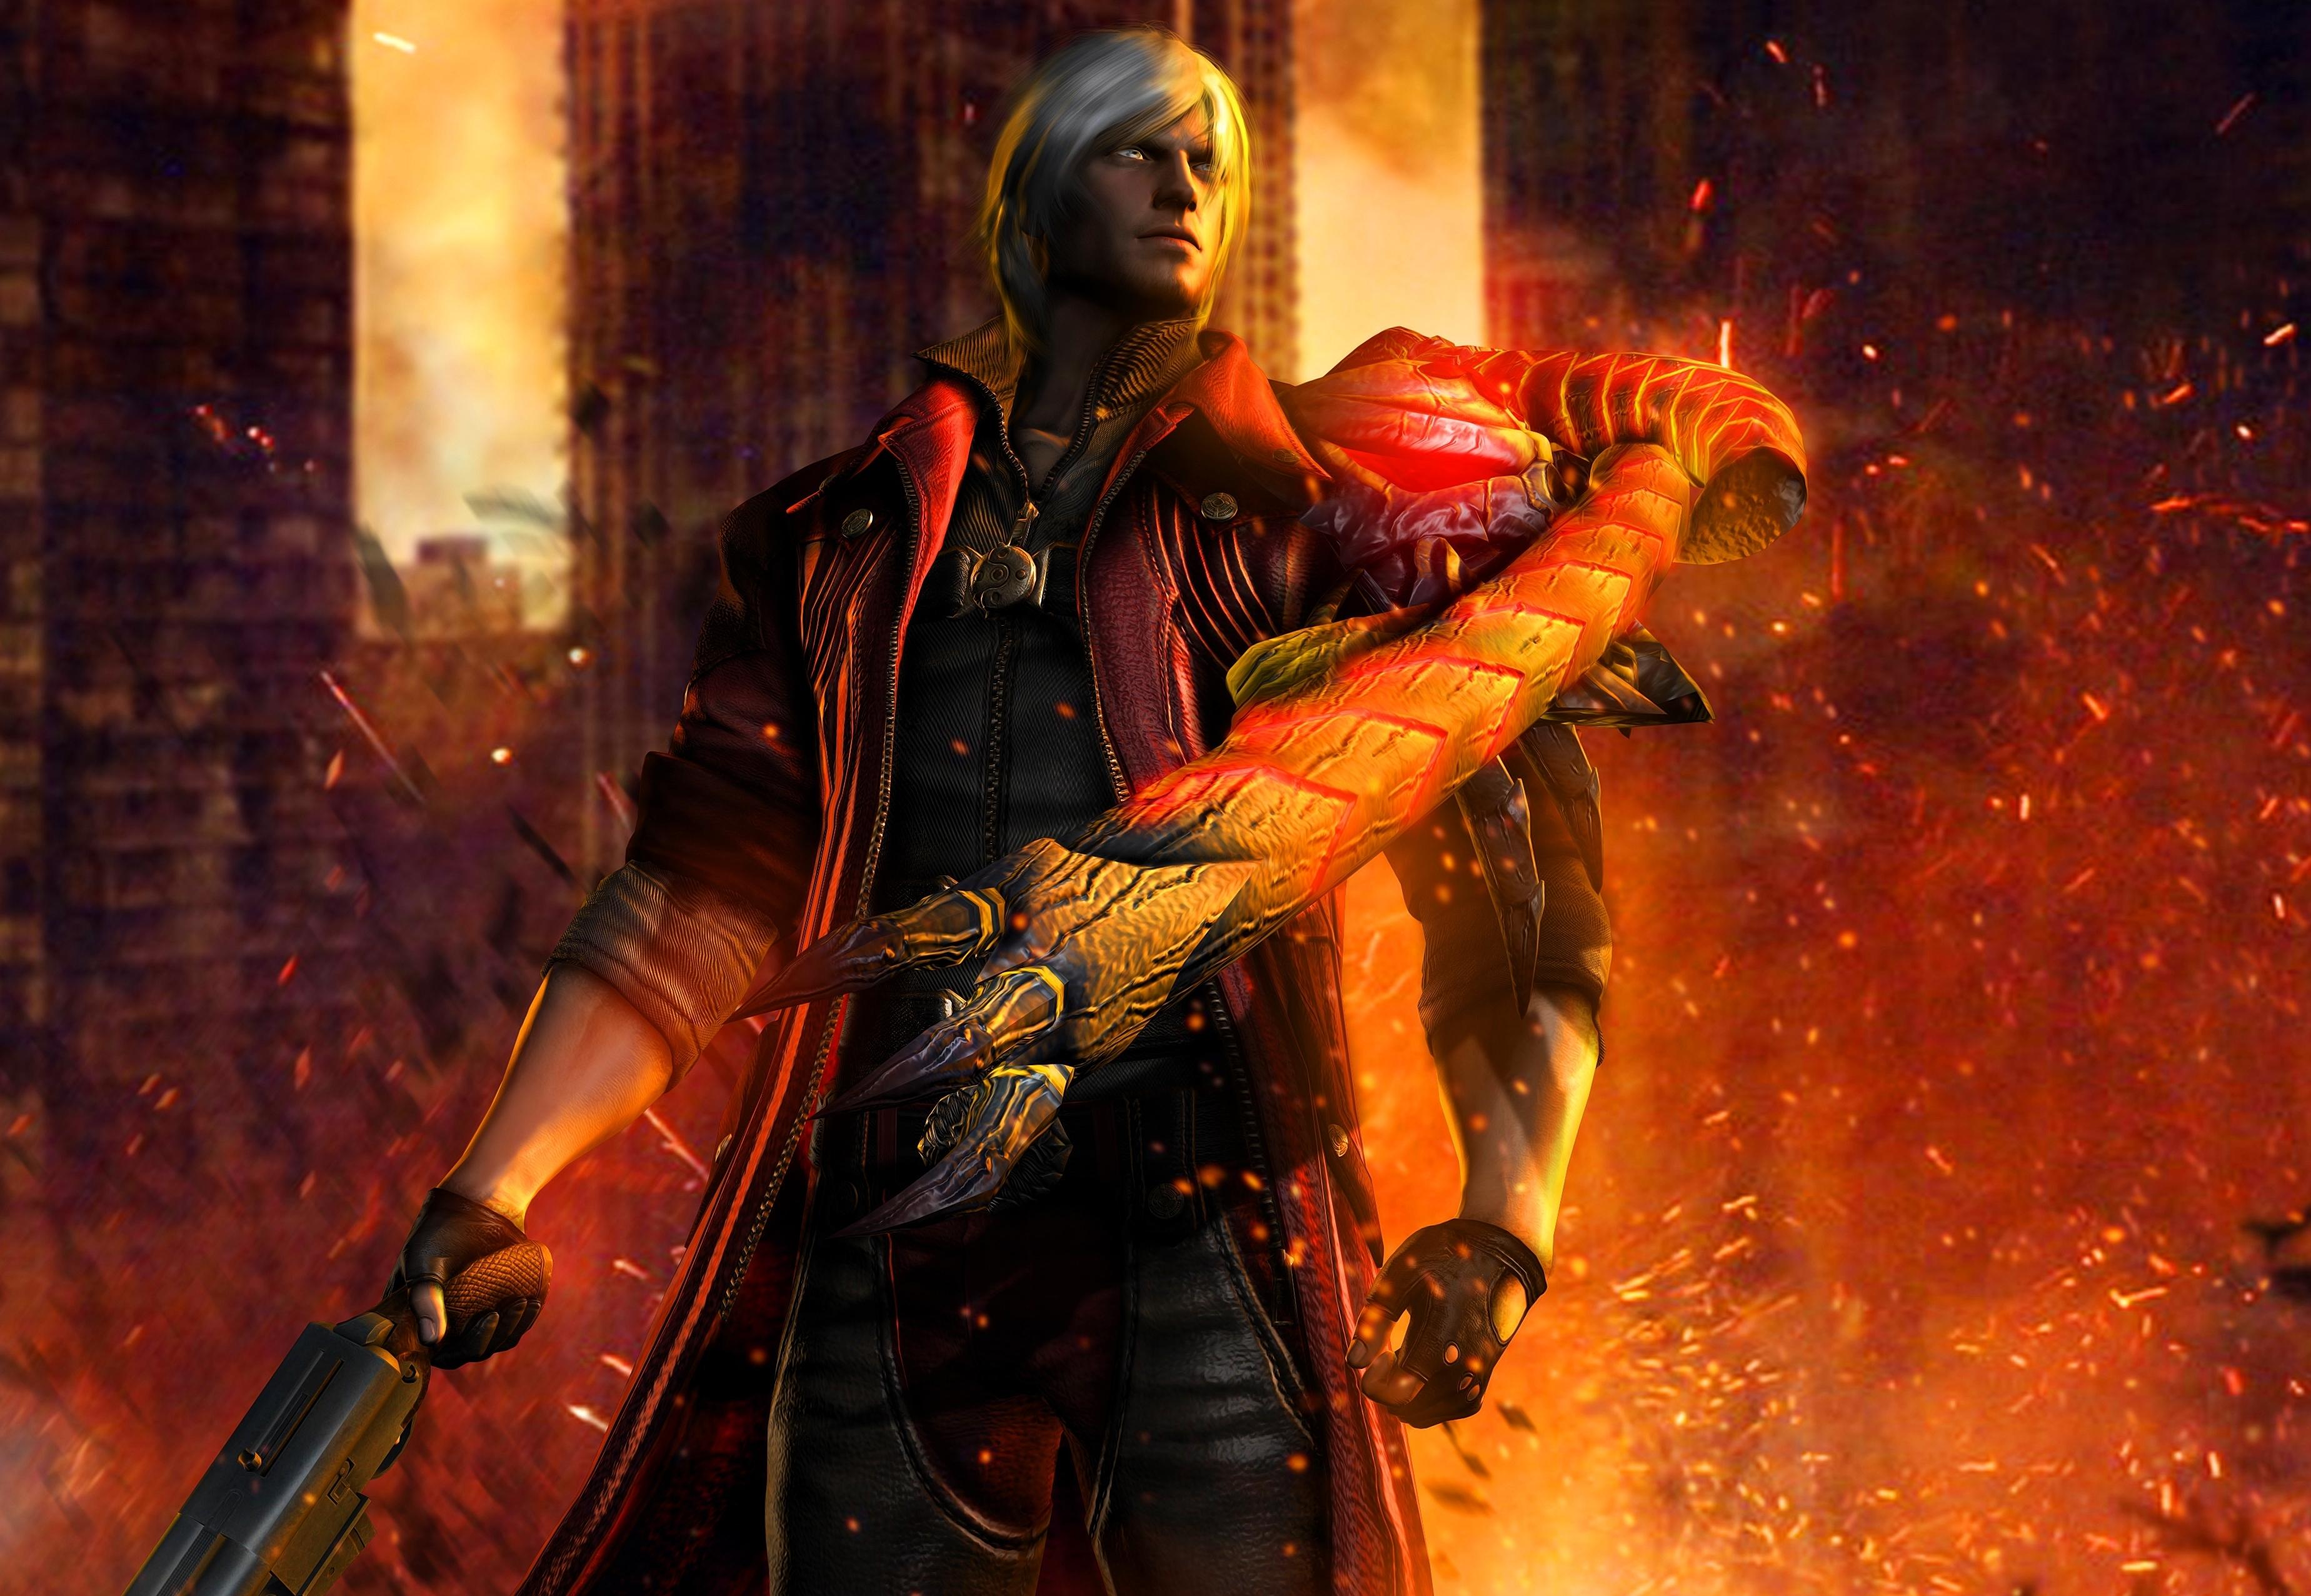 Dante Devil May Cry 4 Wallpaper, HD Games 4K Wallpapers ...